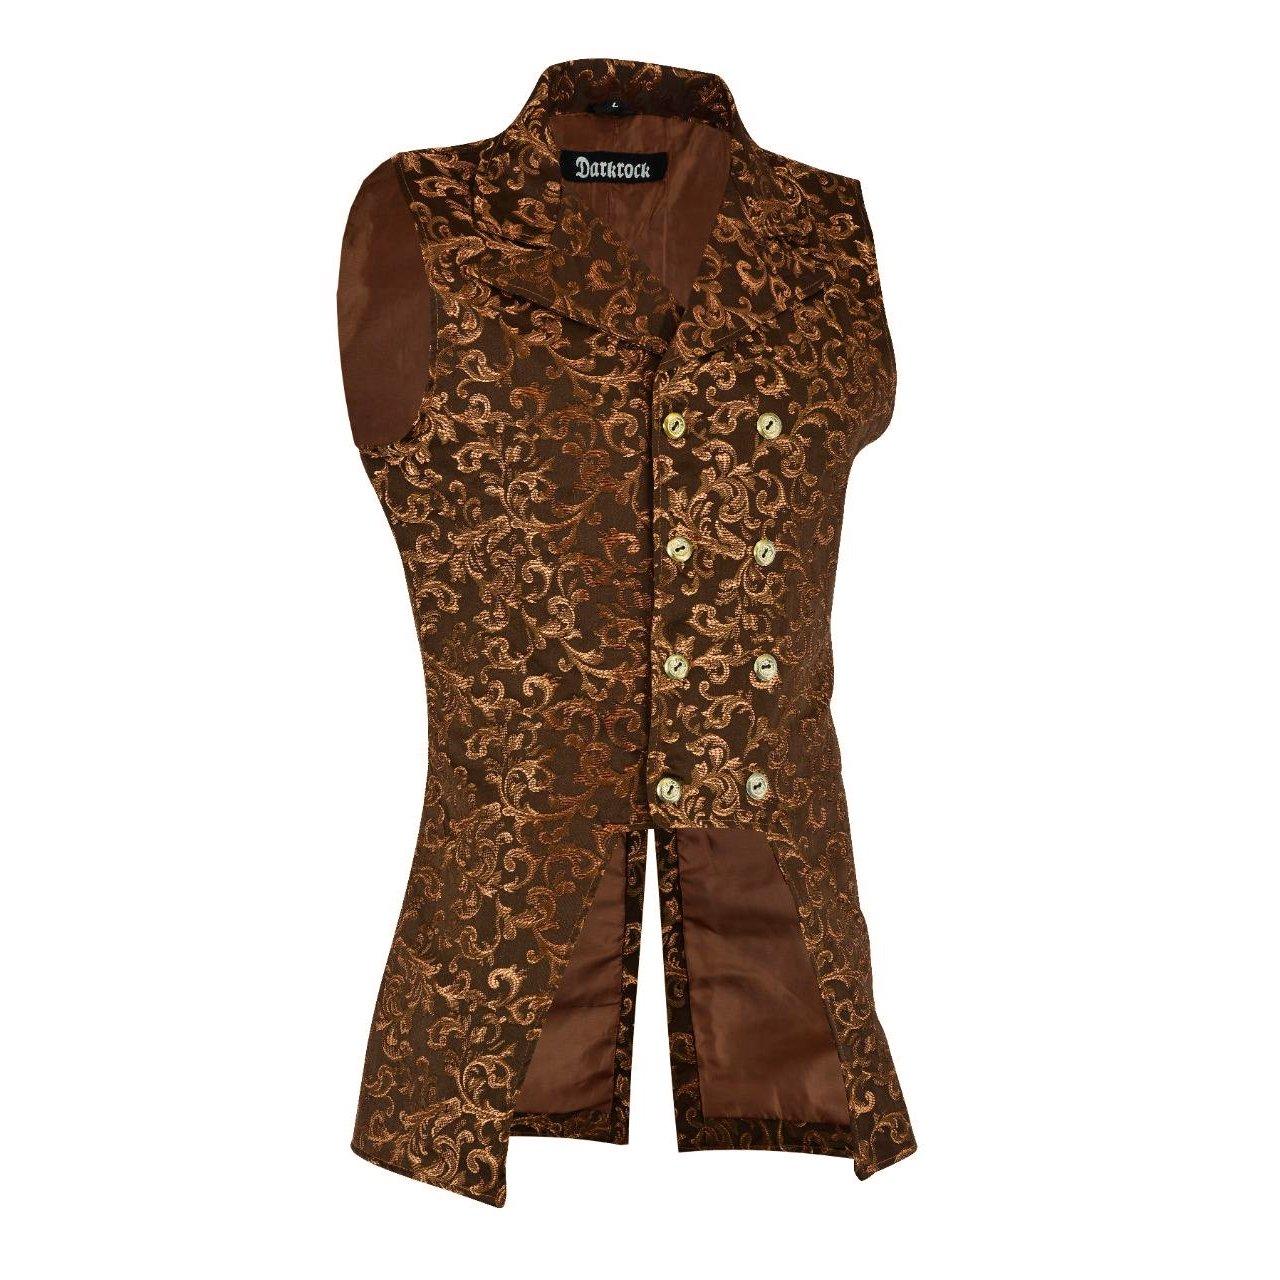 DARKROCK Gold Brocade Double Breasted GOVERNOR Vest Waistcoat(Side) .jpg